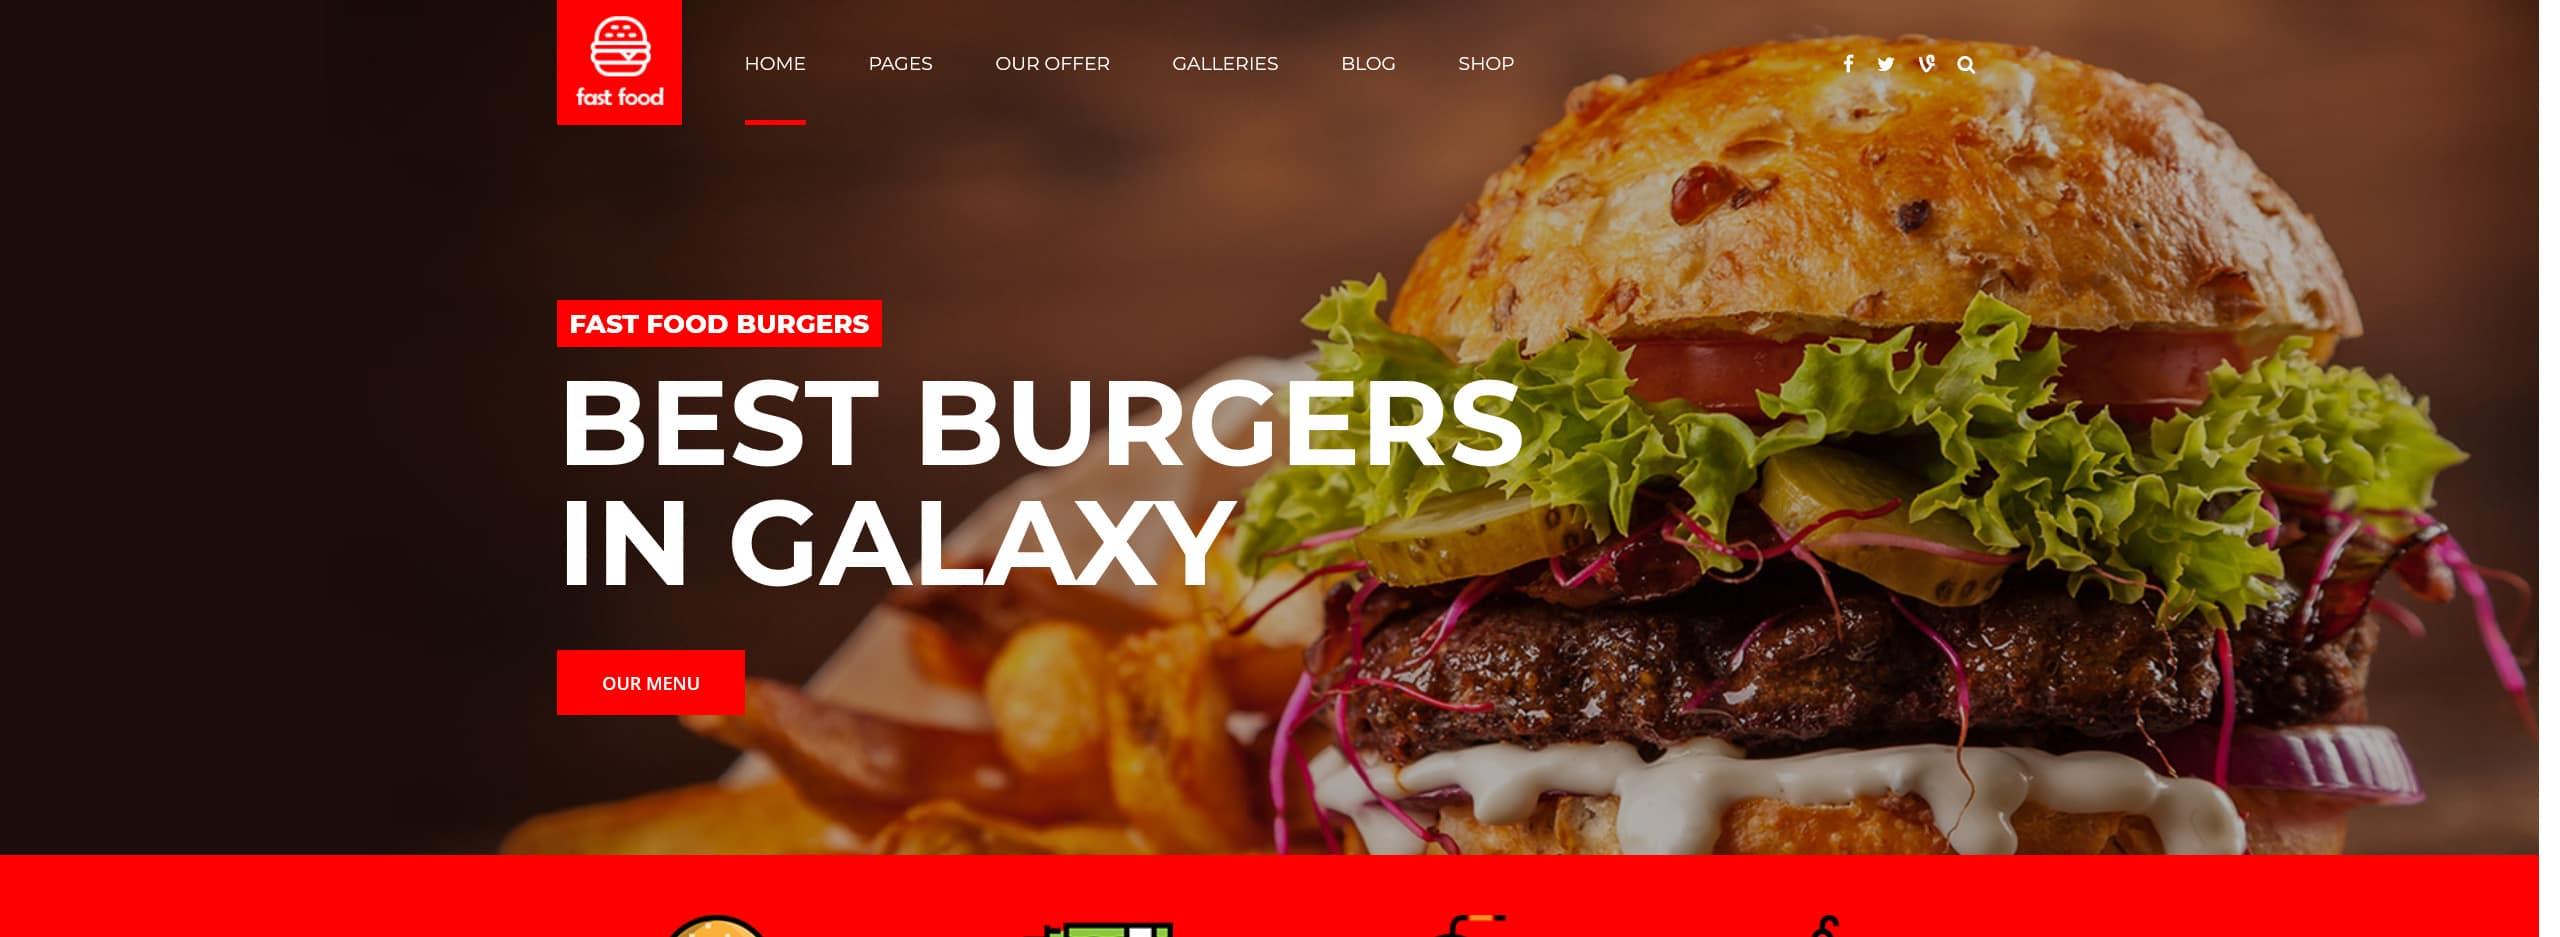 Burger and Fries Wordpress website, web design services